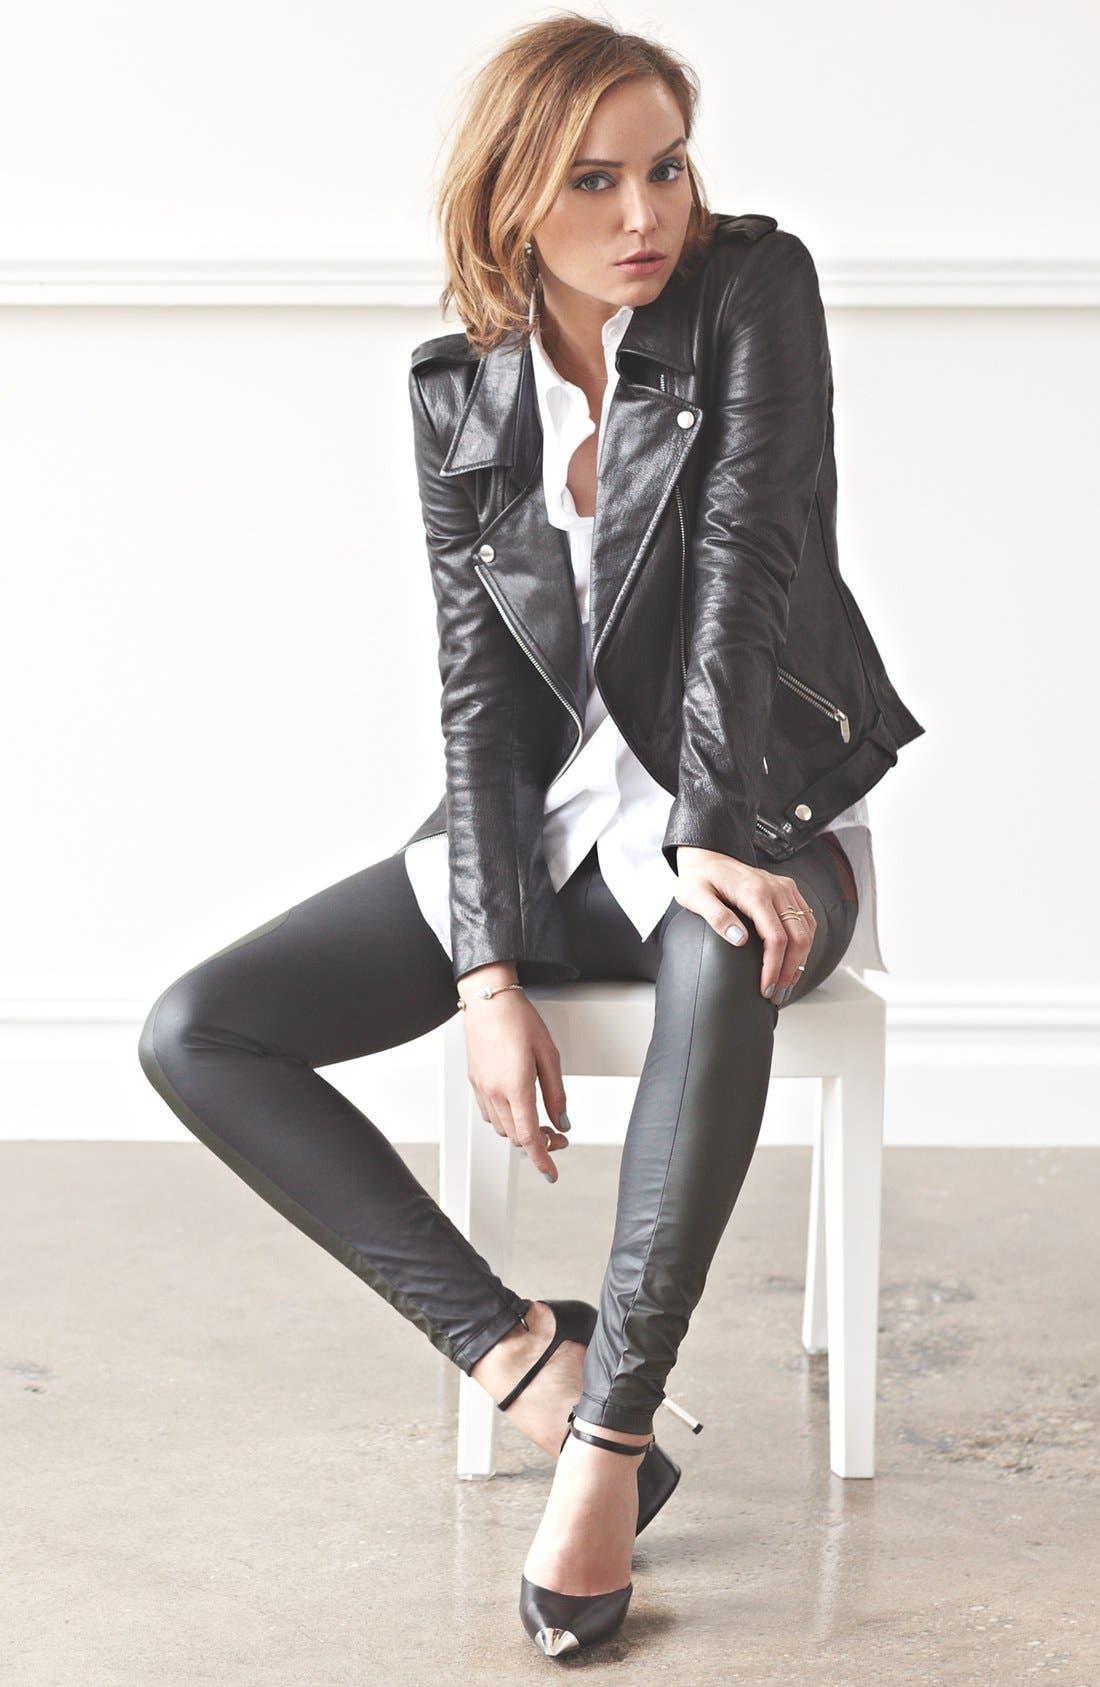 Main Image - Theyskens' Theory Jacket & MSGM Leather Leggings